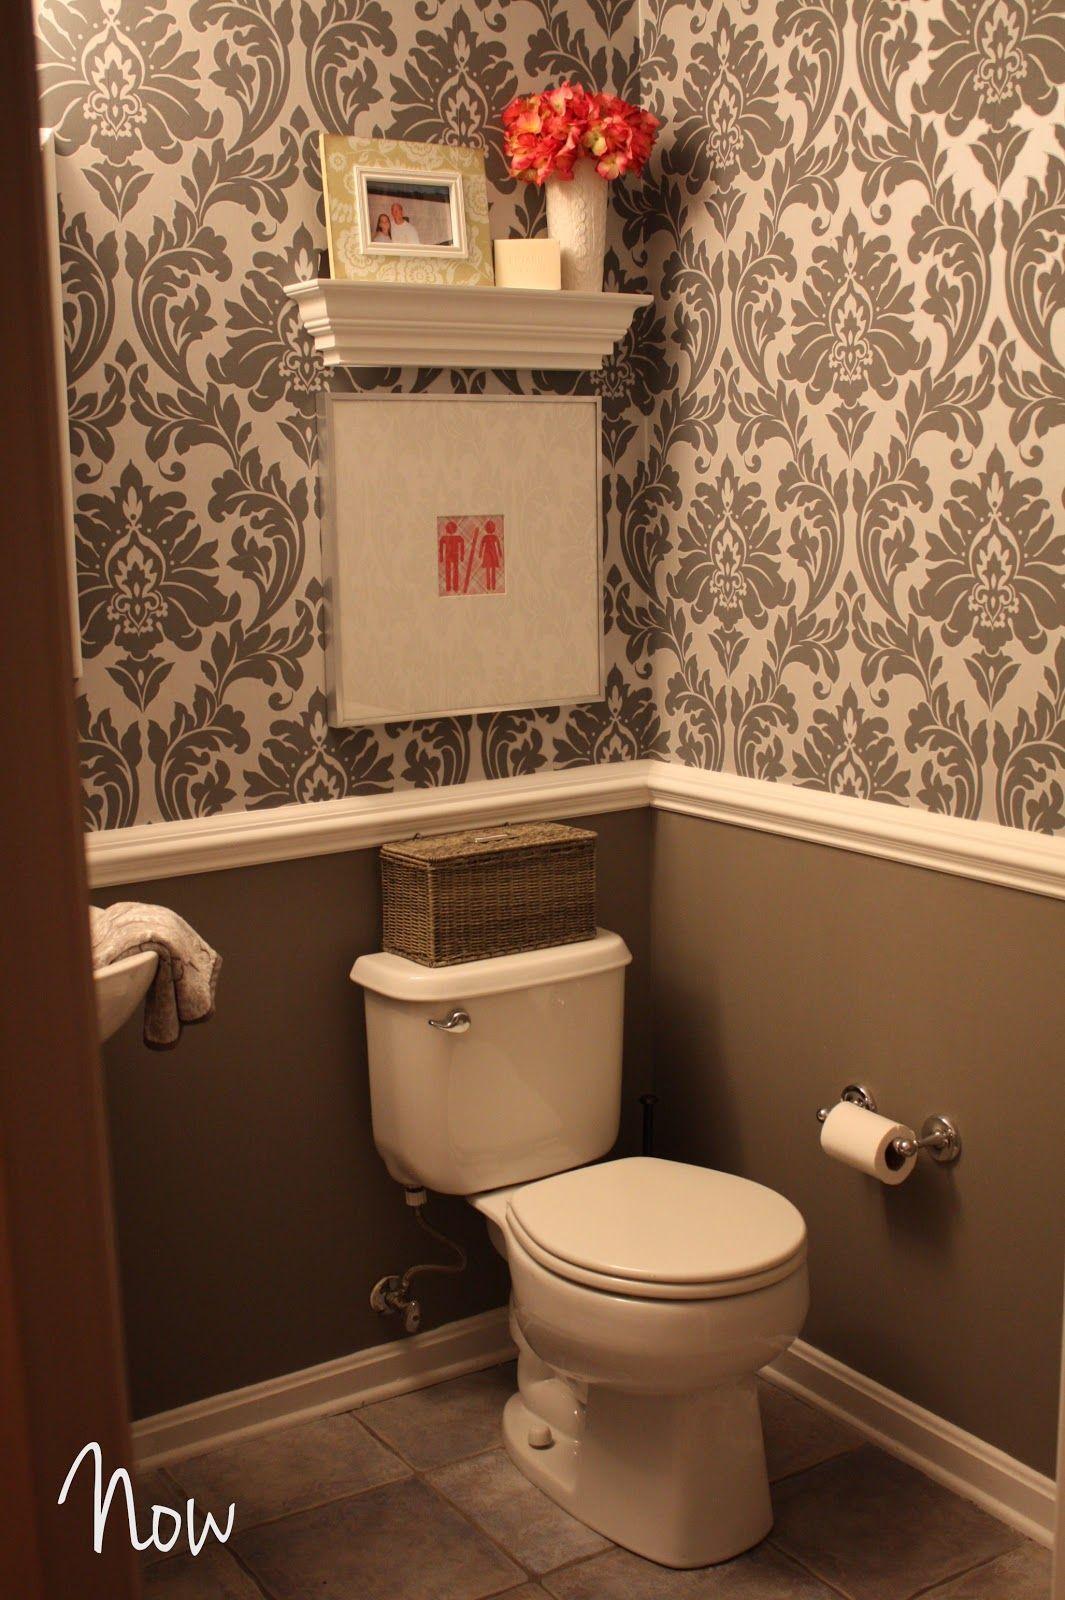 Put A Little Part 2 Powder Room Gets Some Jewelry Powder Room Redo Powder Room Bathroom Decor